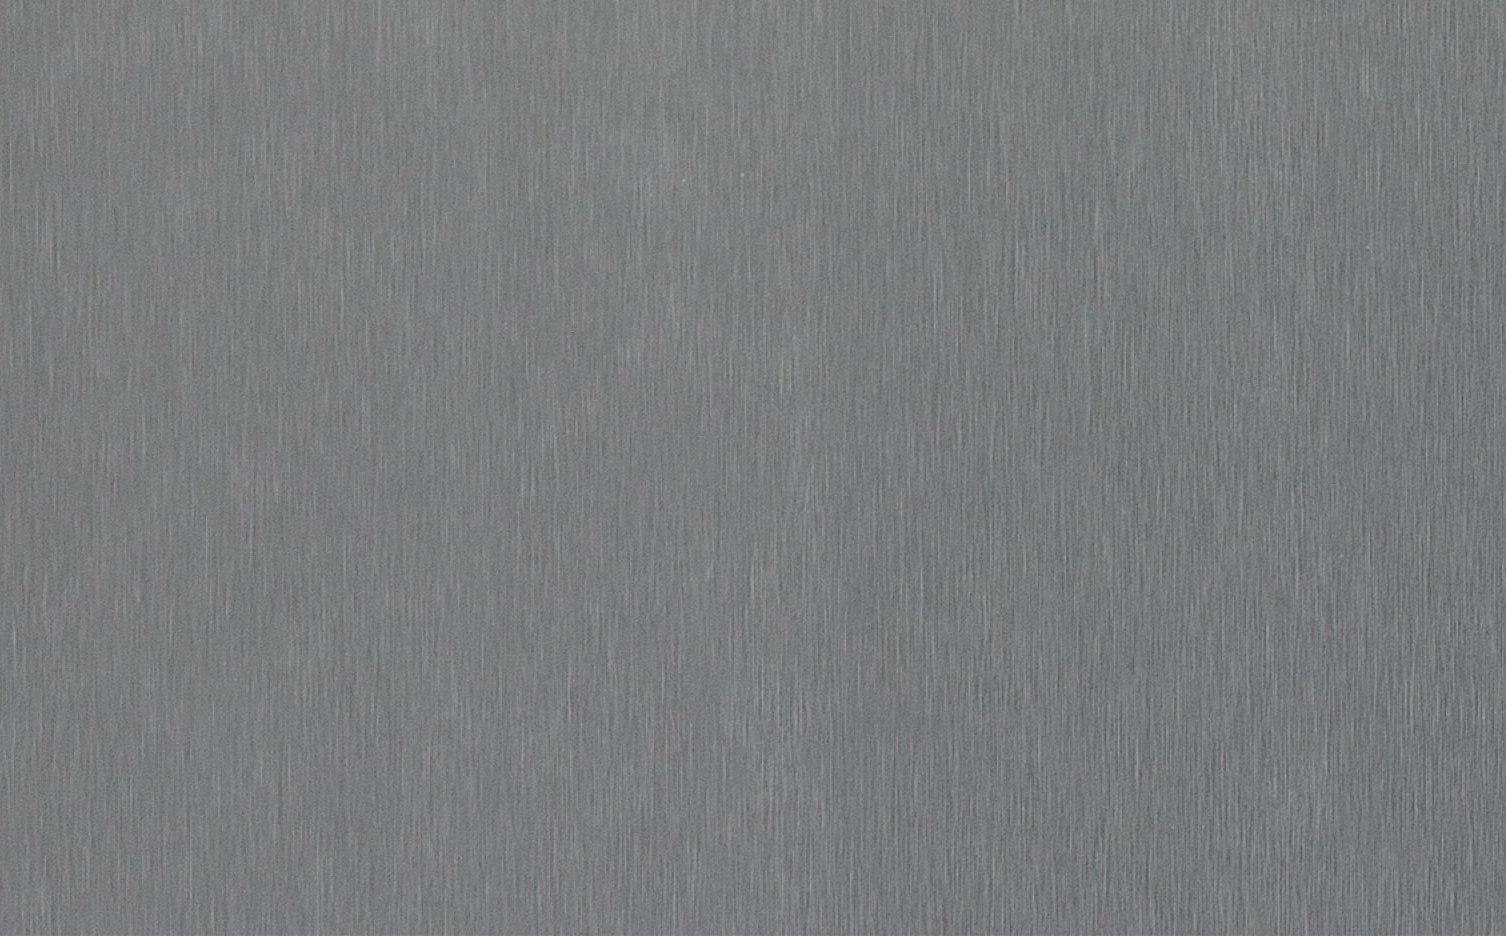 Välitilan laminaatti Alumiini 7250 levy 3x600x1200 mm  Taloon com